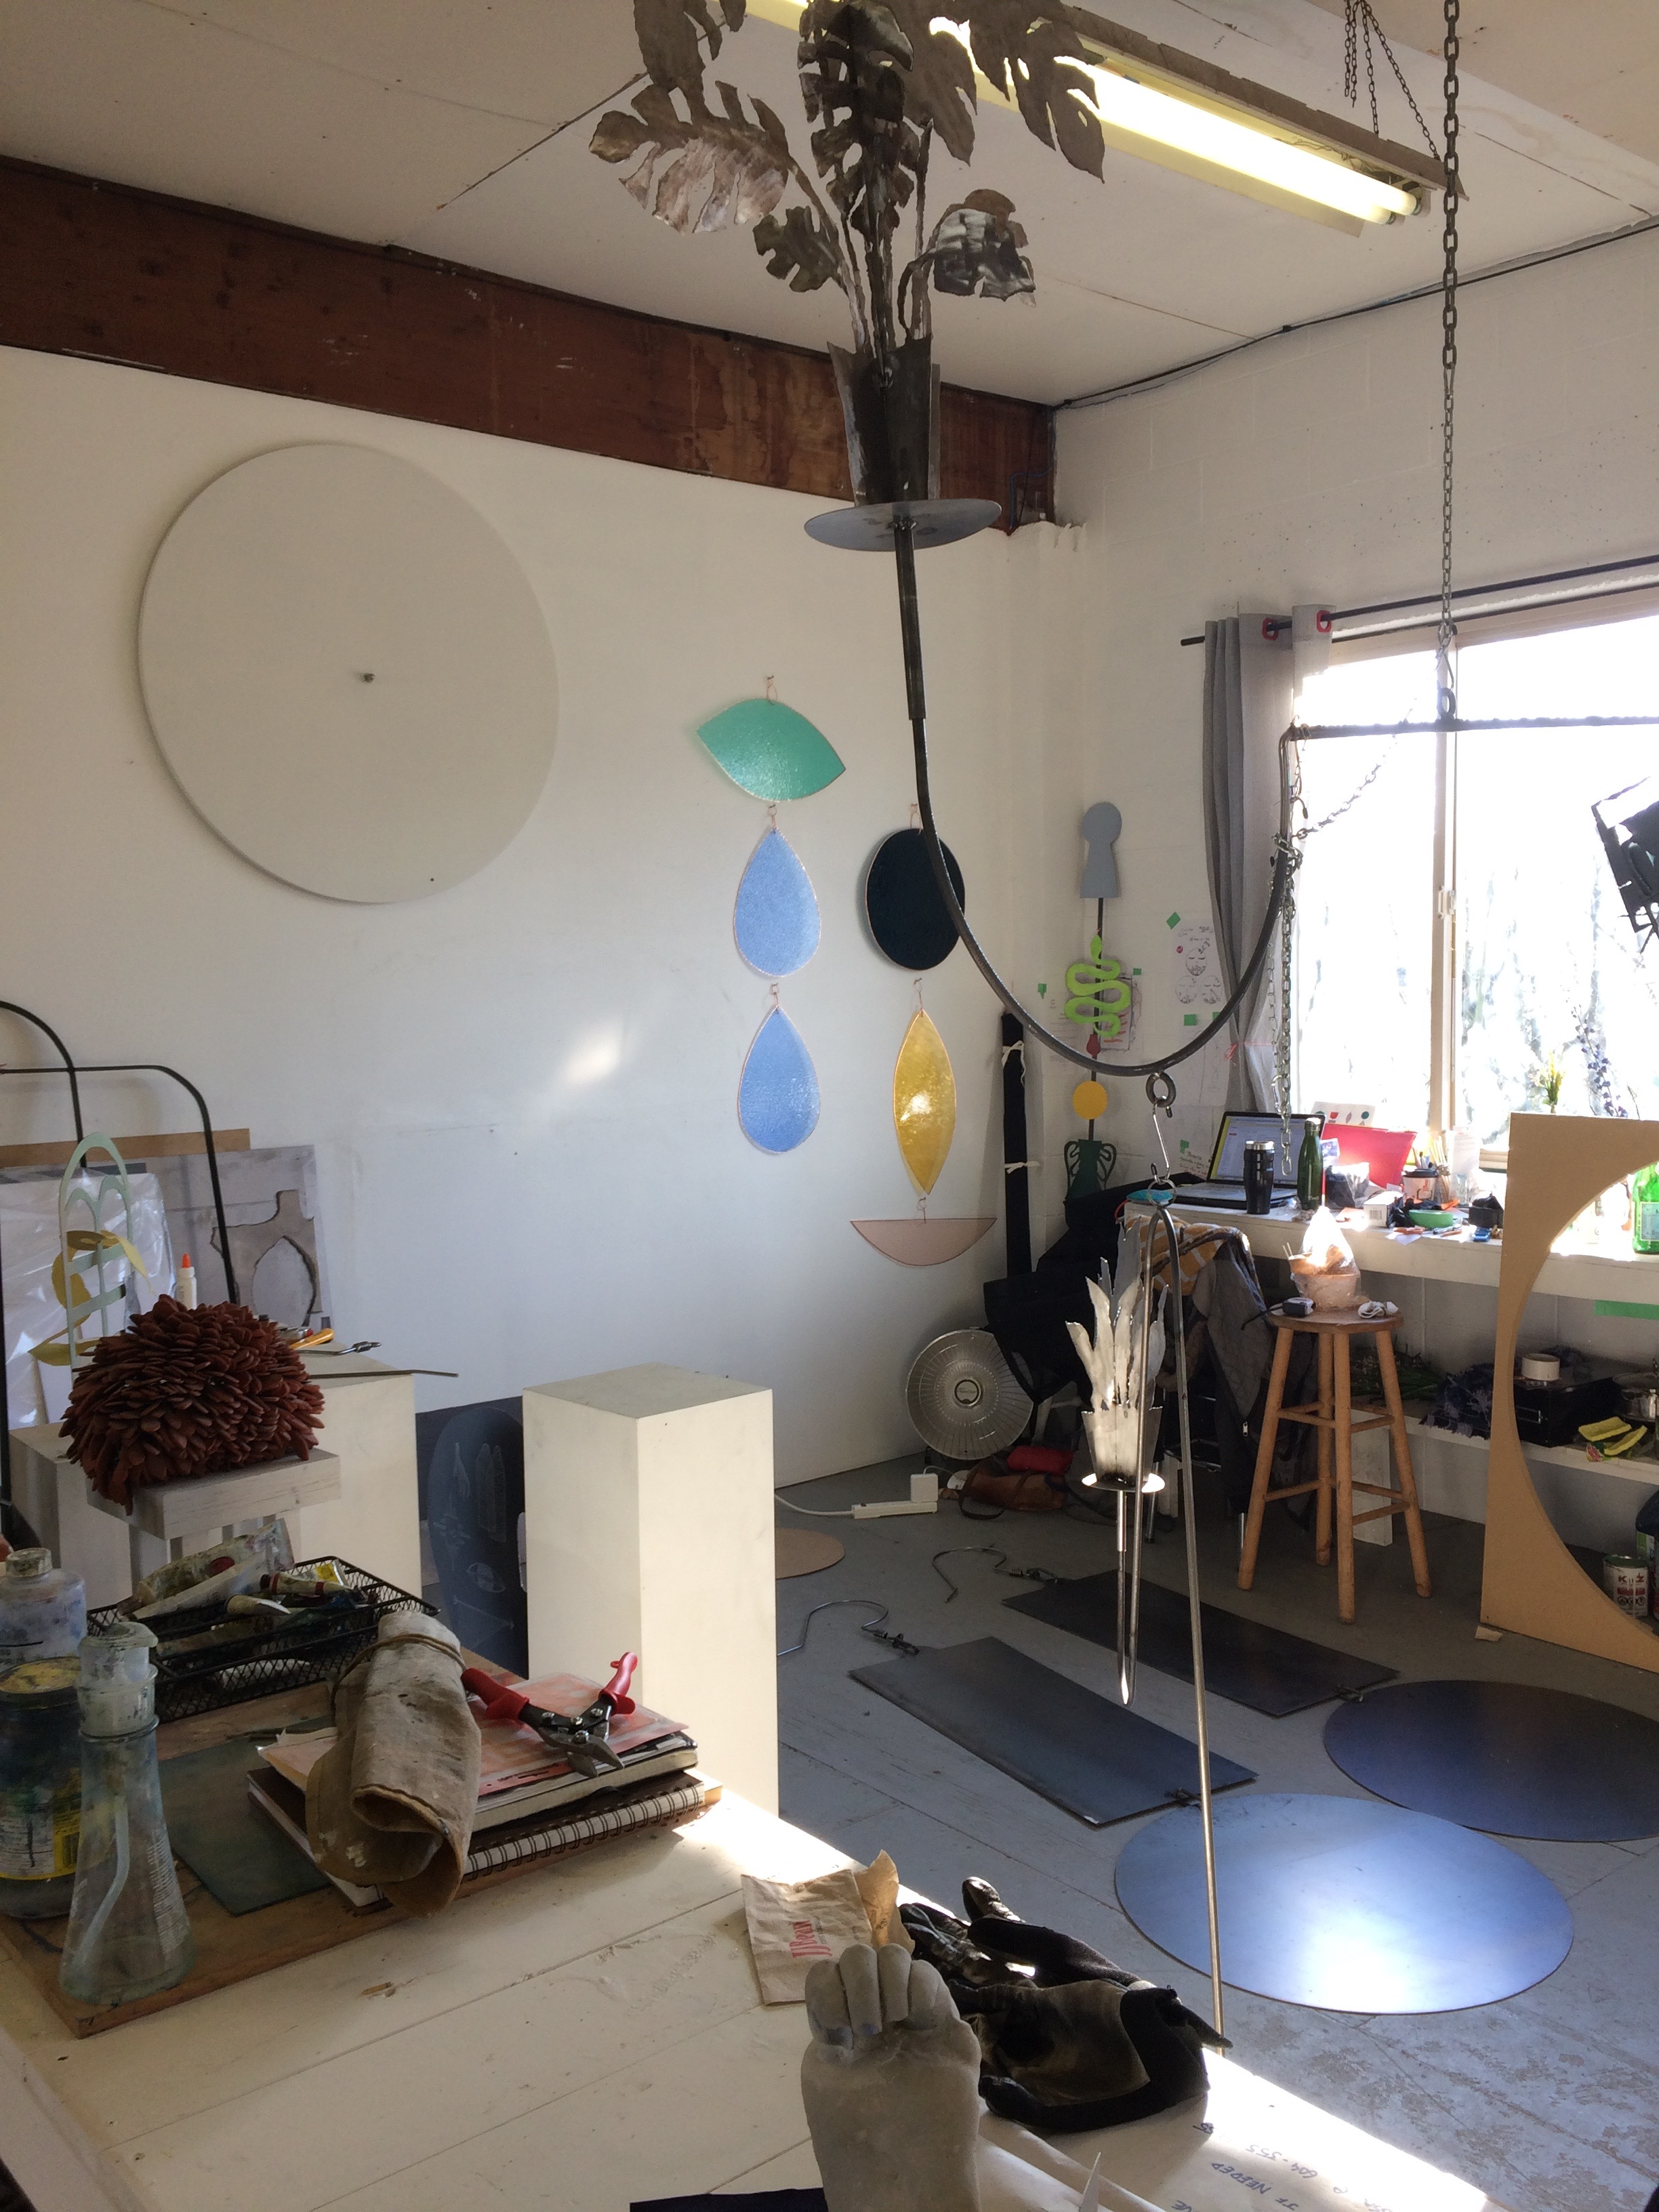 Image: Vanessa Brown's studio.  LINK TO PODCAST HERE:   http://www.overlydedicatedpodcast.ca/e/episode-4-vanessa-brown/